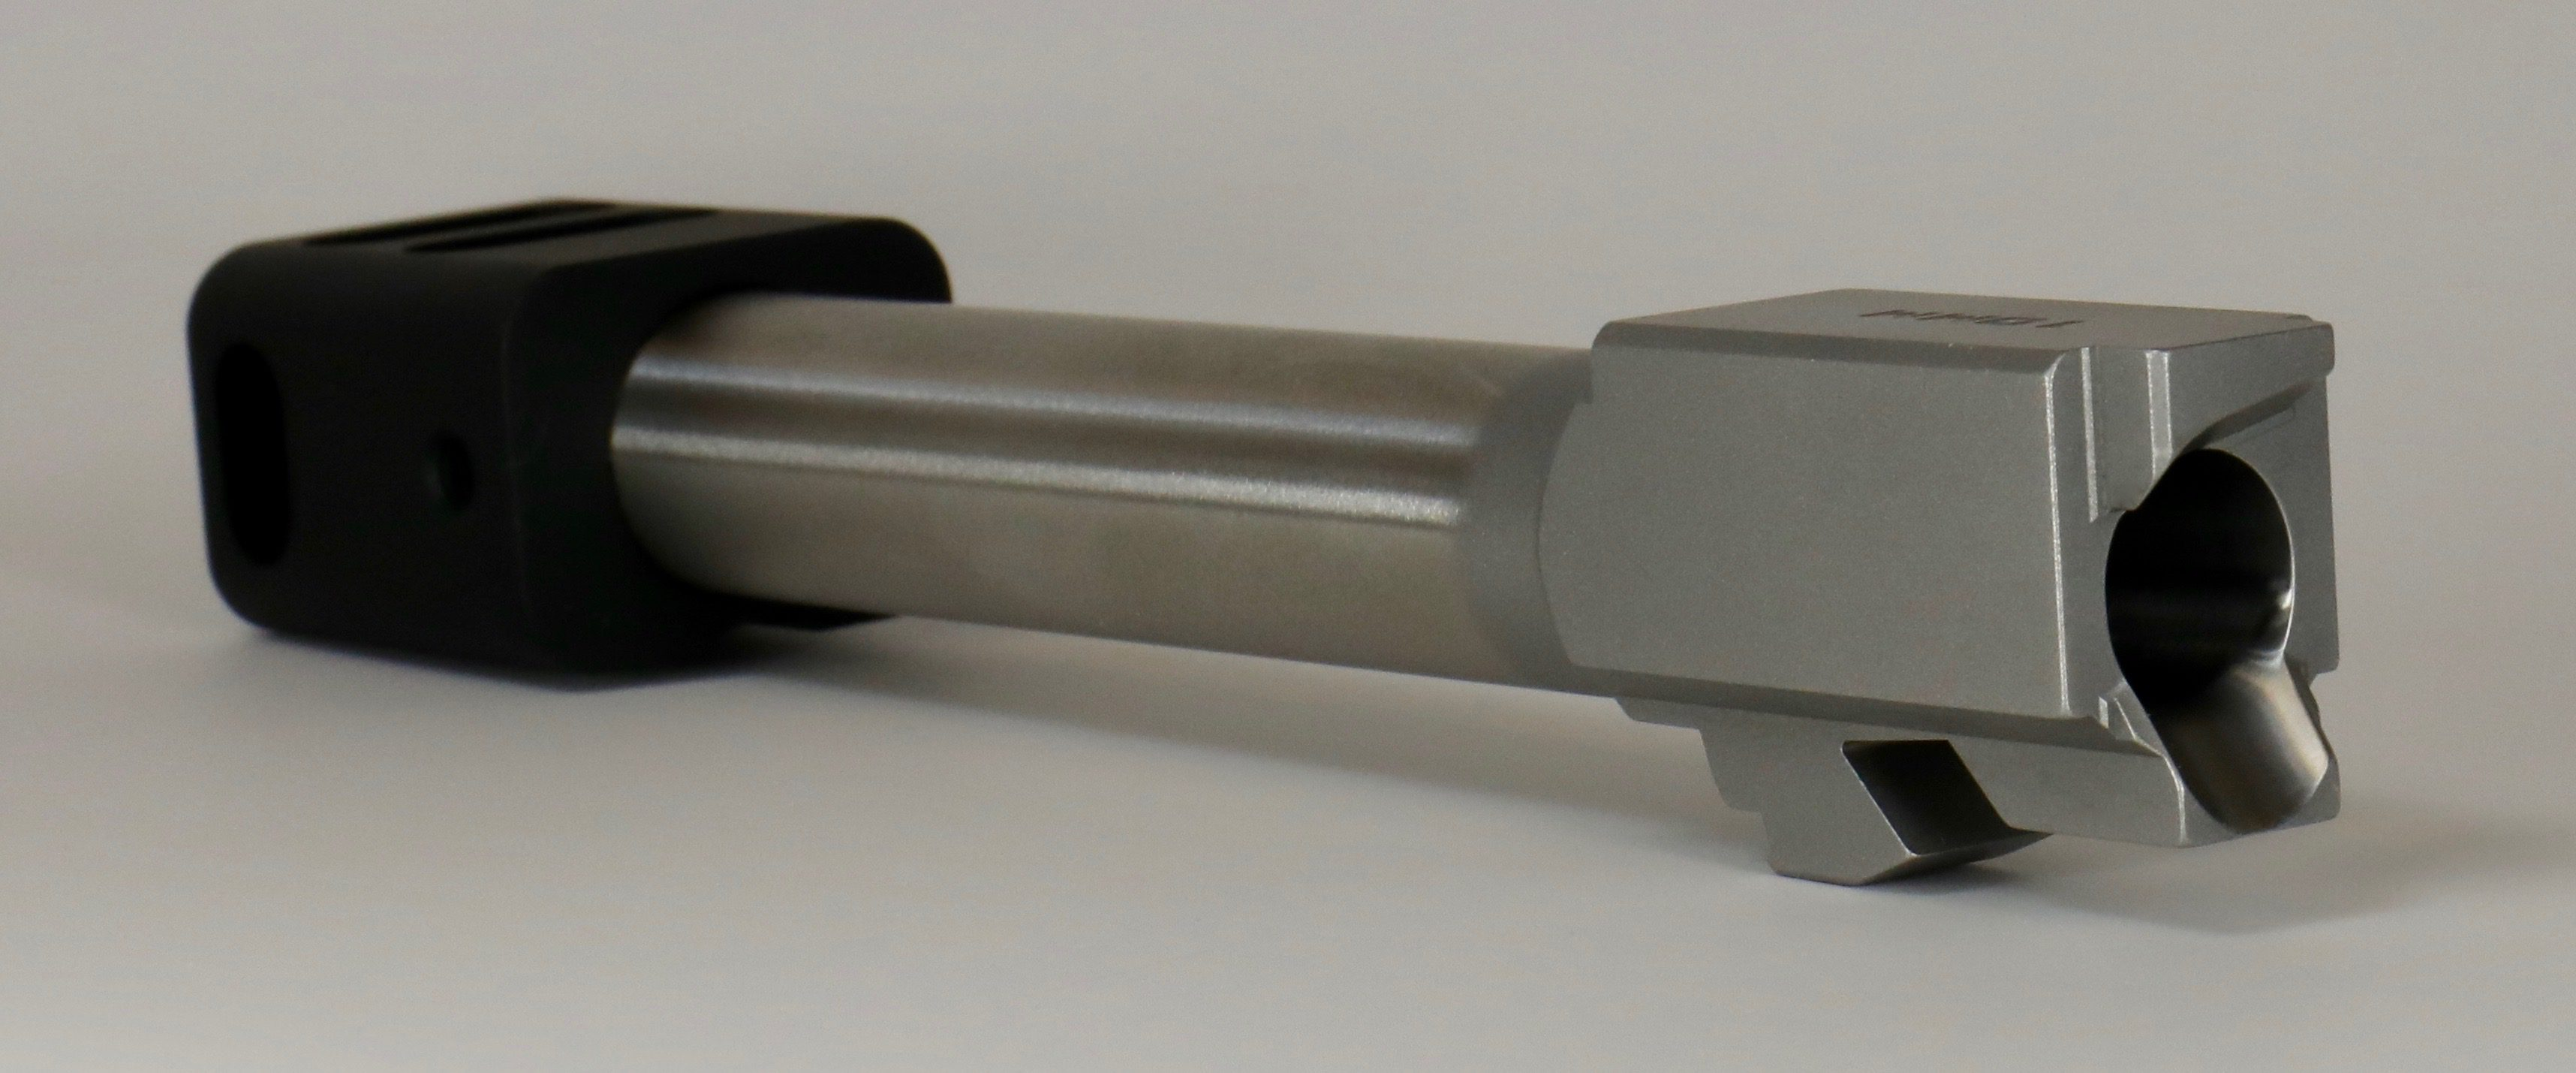 Glock 20 Match 10MM Barrel with 4-Port Compensator